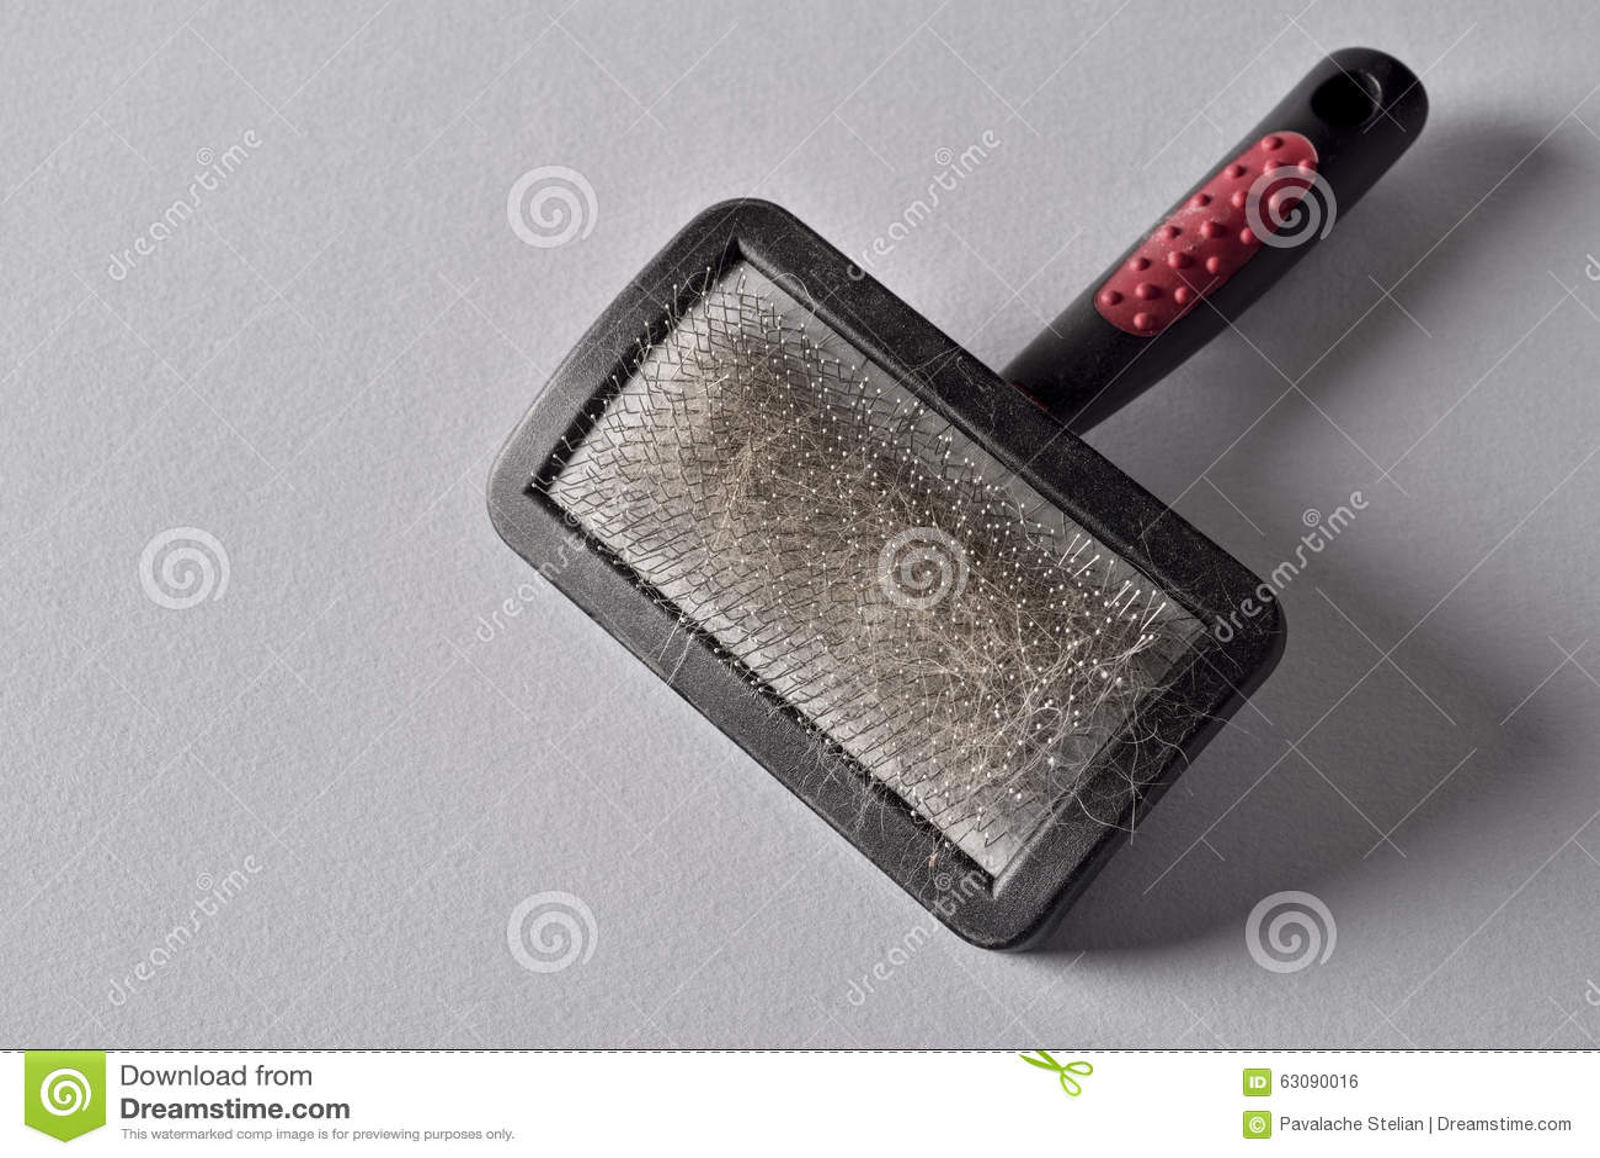 Pets brush